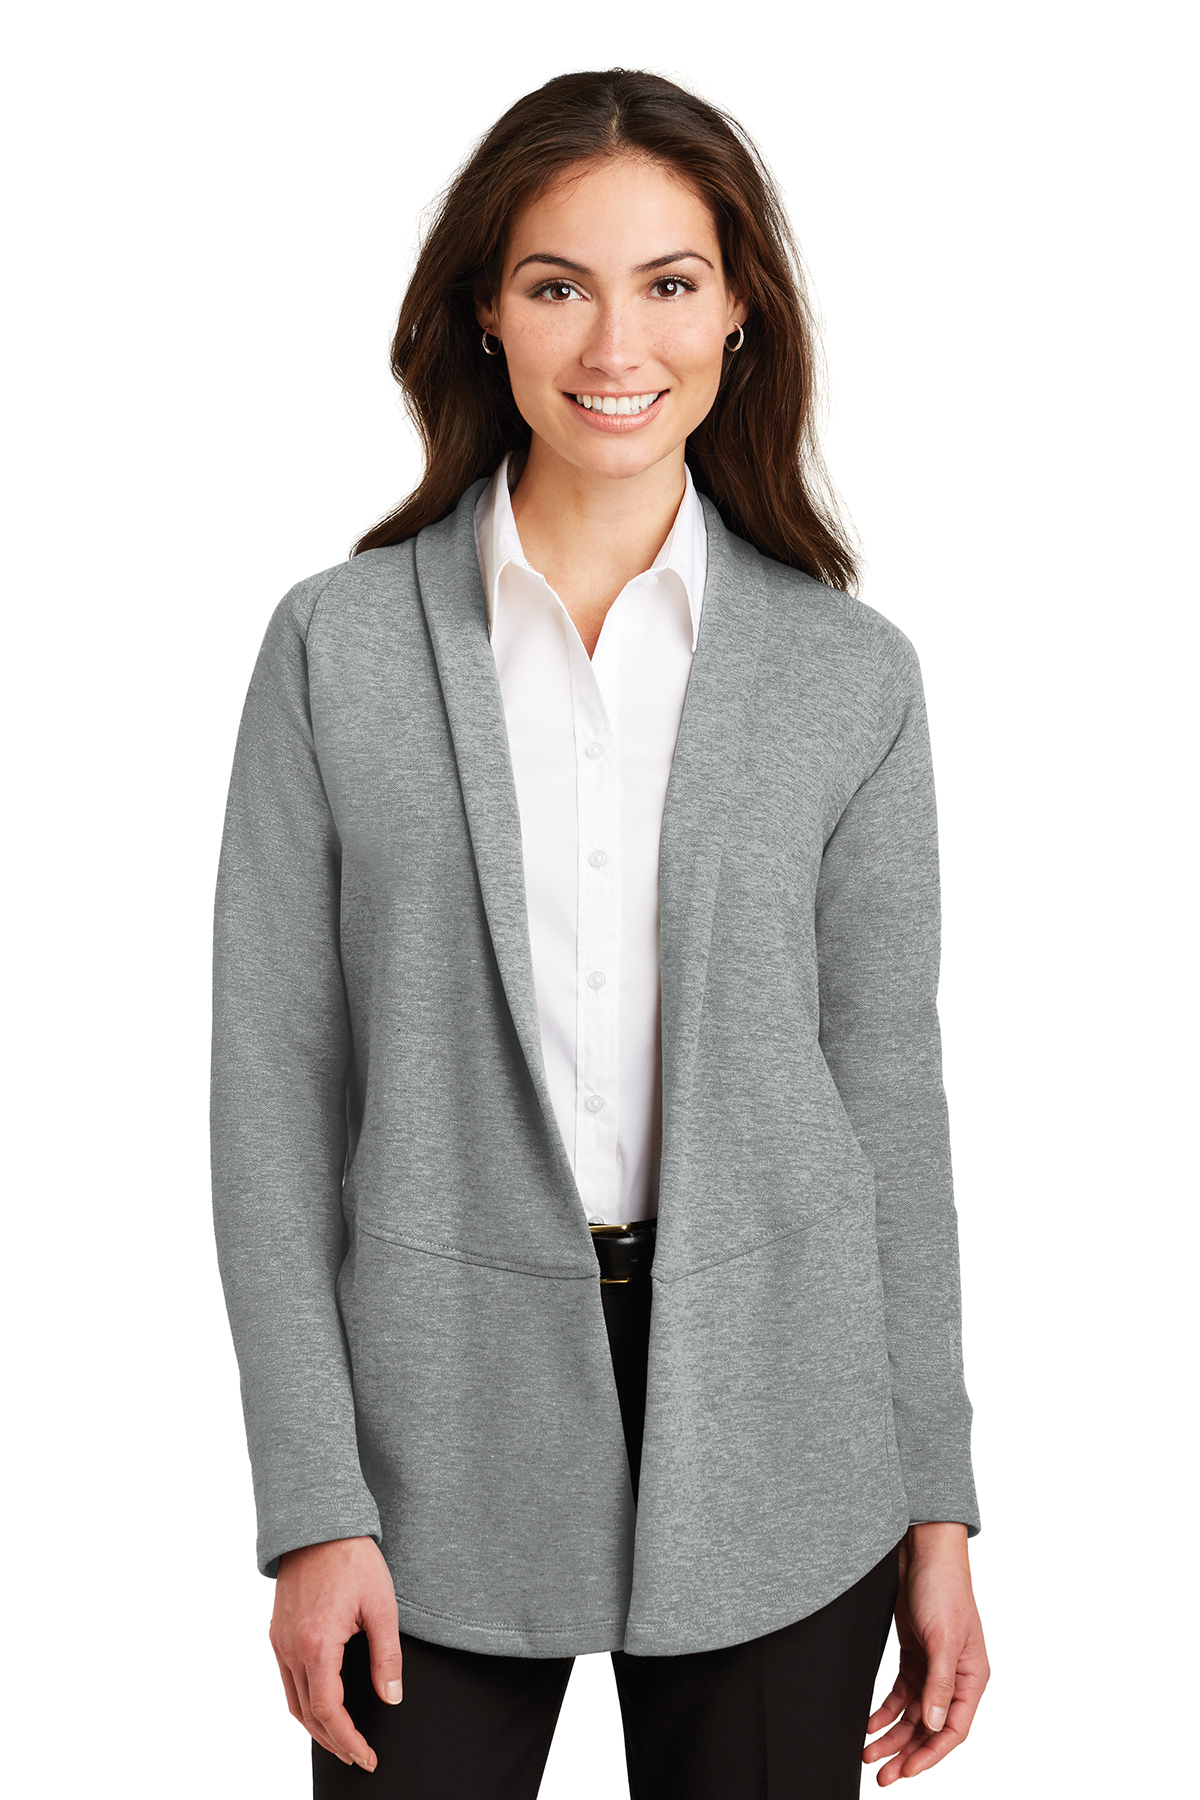 67836d168 Port Authority® Ladies Interlock Cardigan   Sweaters   Polos/Knits ...